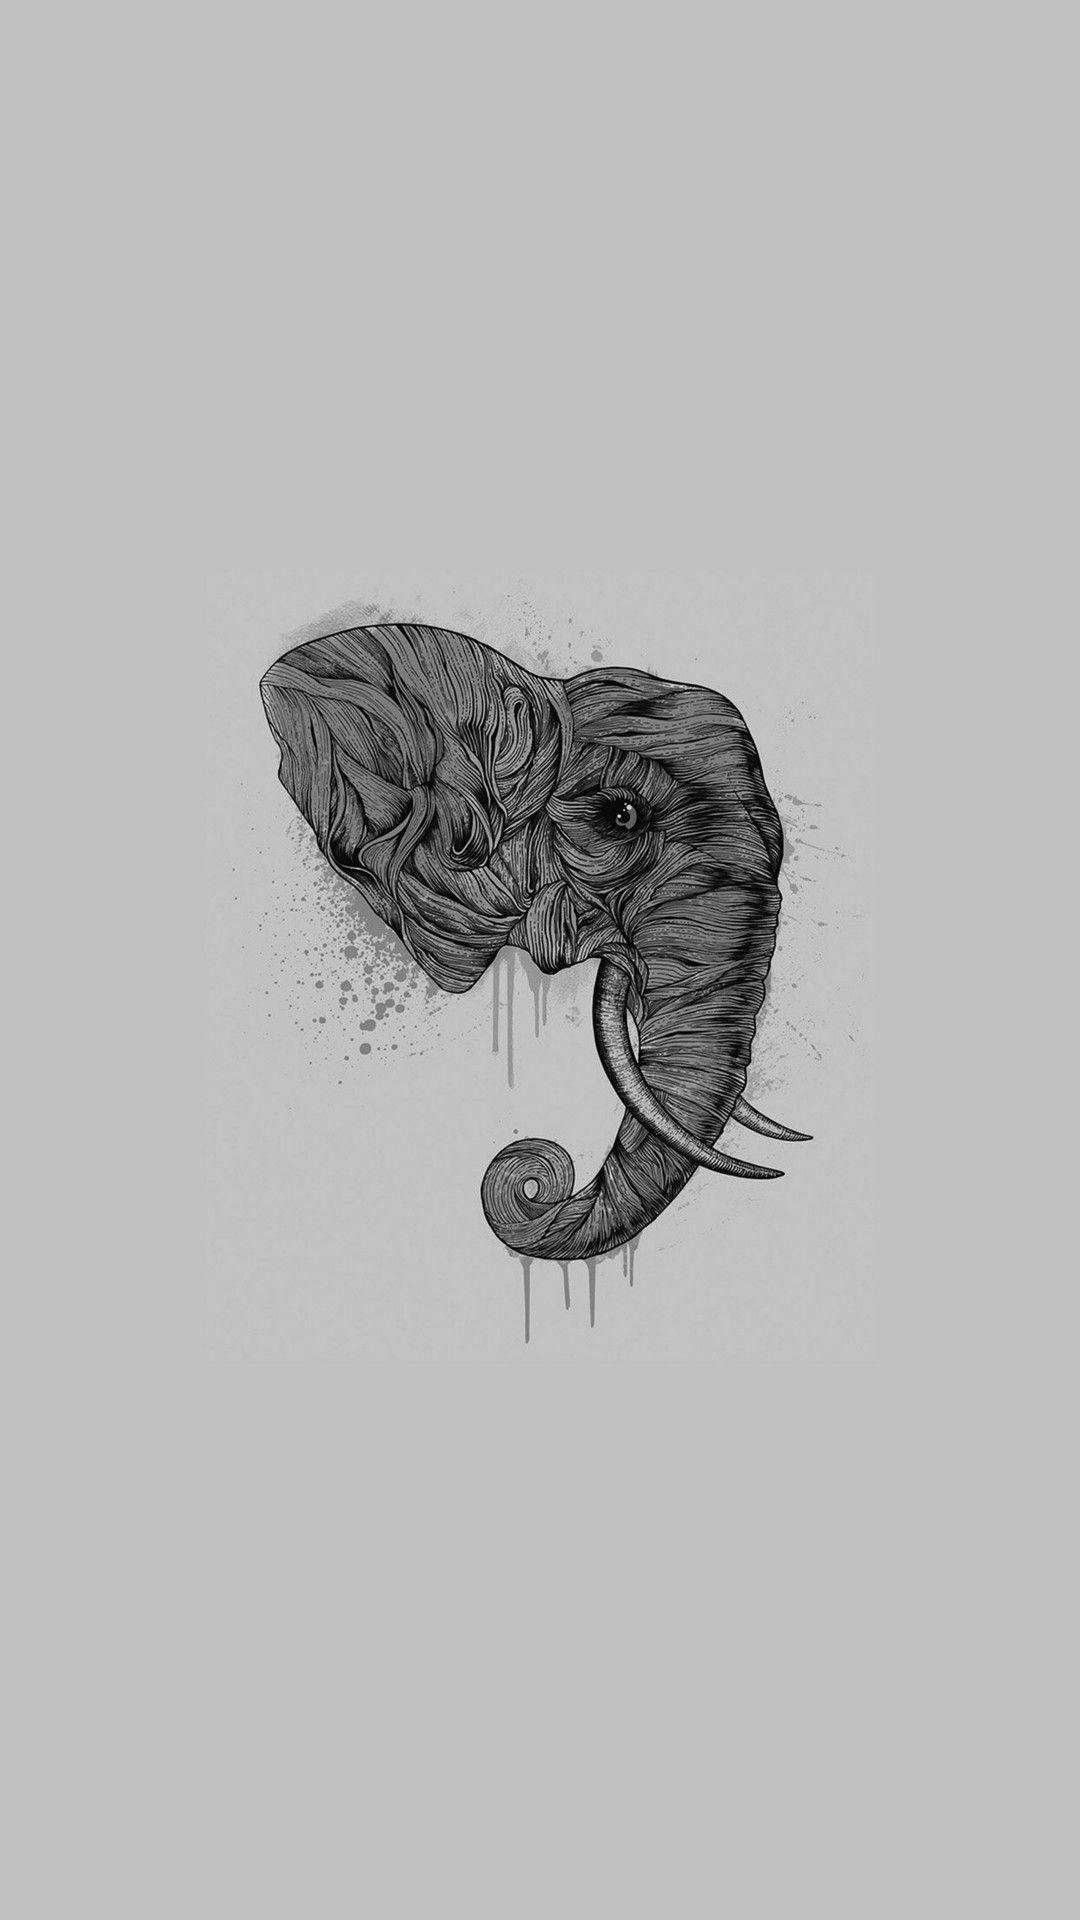 Elephant art ddark illust drawing animal iphone 6 plus wallpaper